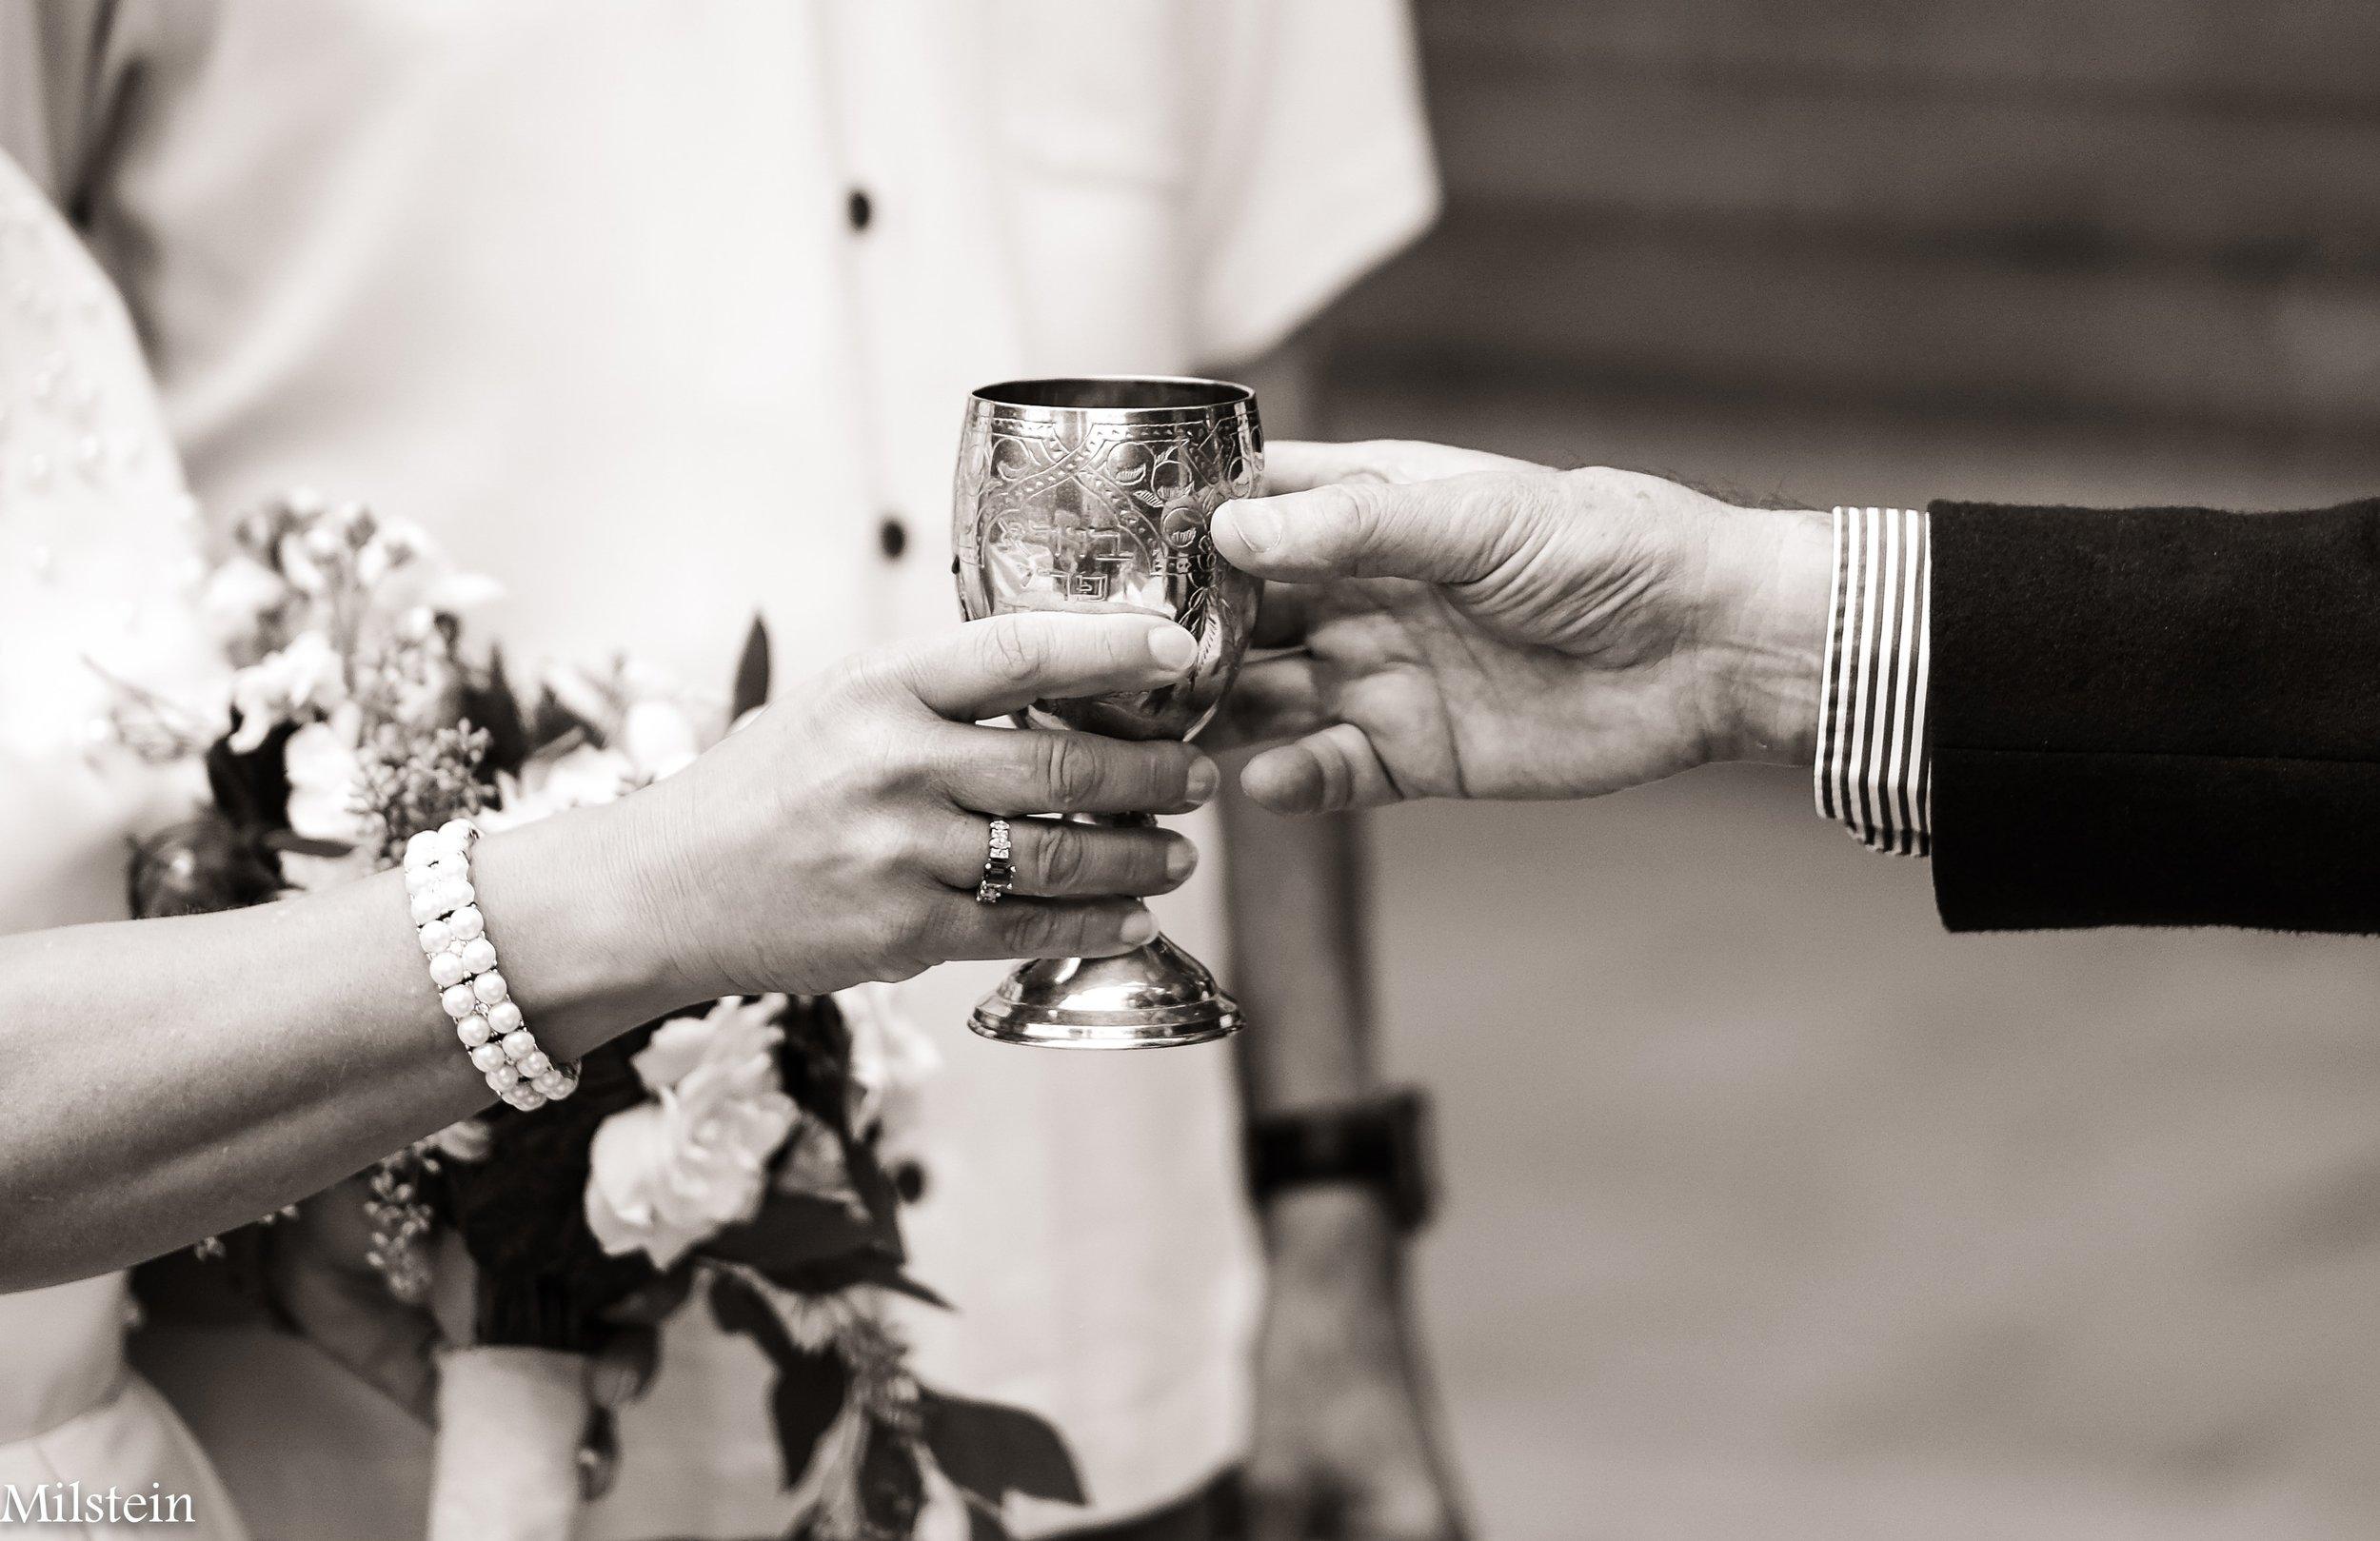 Wedding-Photographer-New-York-Amy-Milstein.jpg